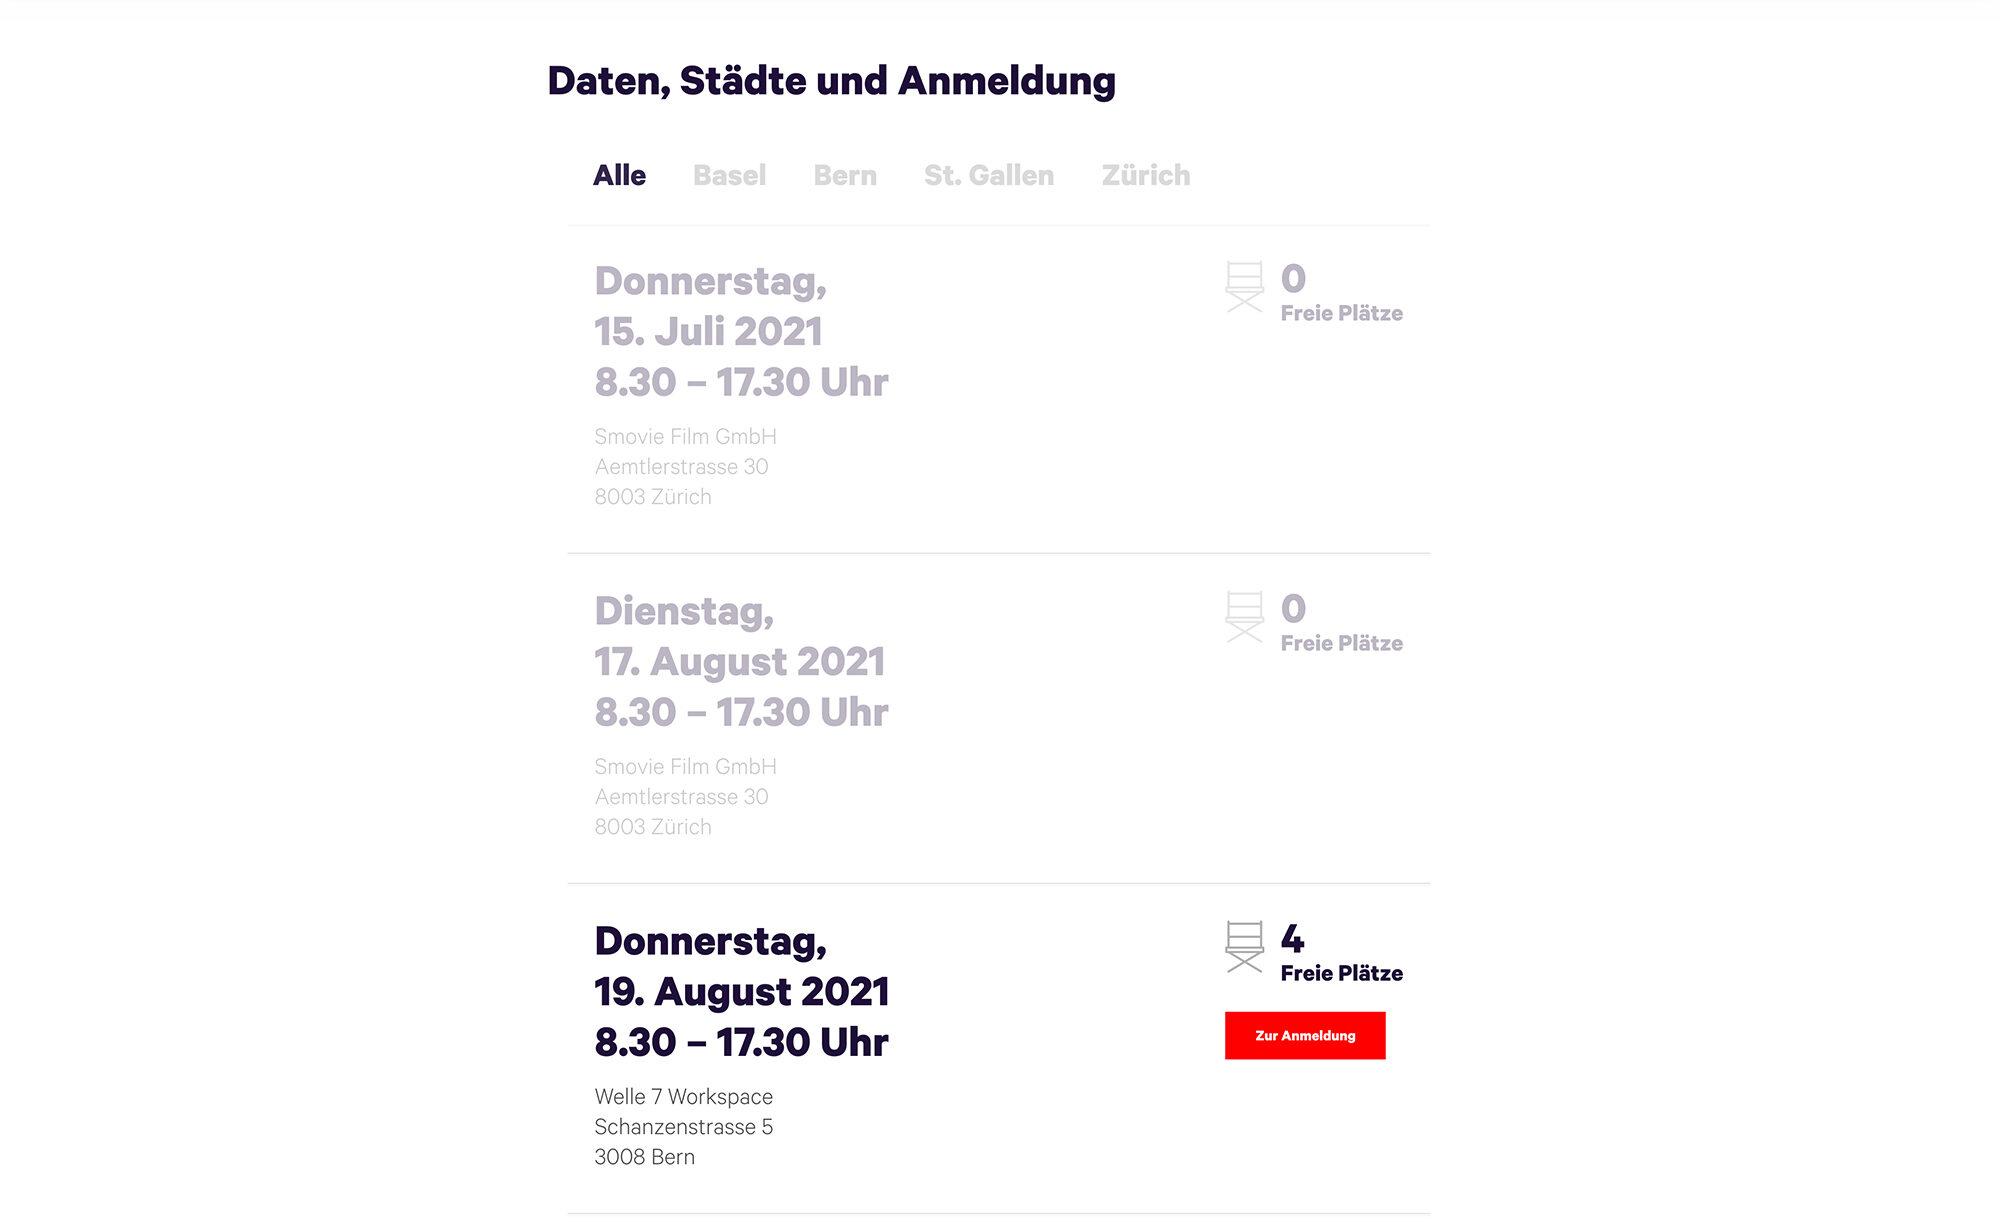 Kurs-Angebote, Screenshot Website - Smovie Film GmbH, smovie.ch